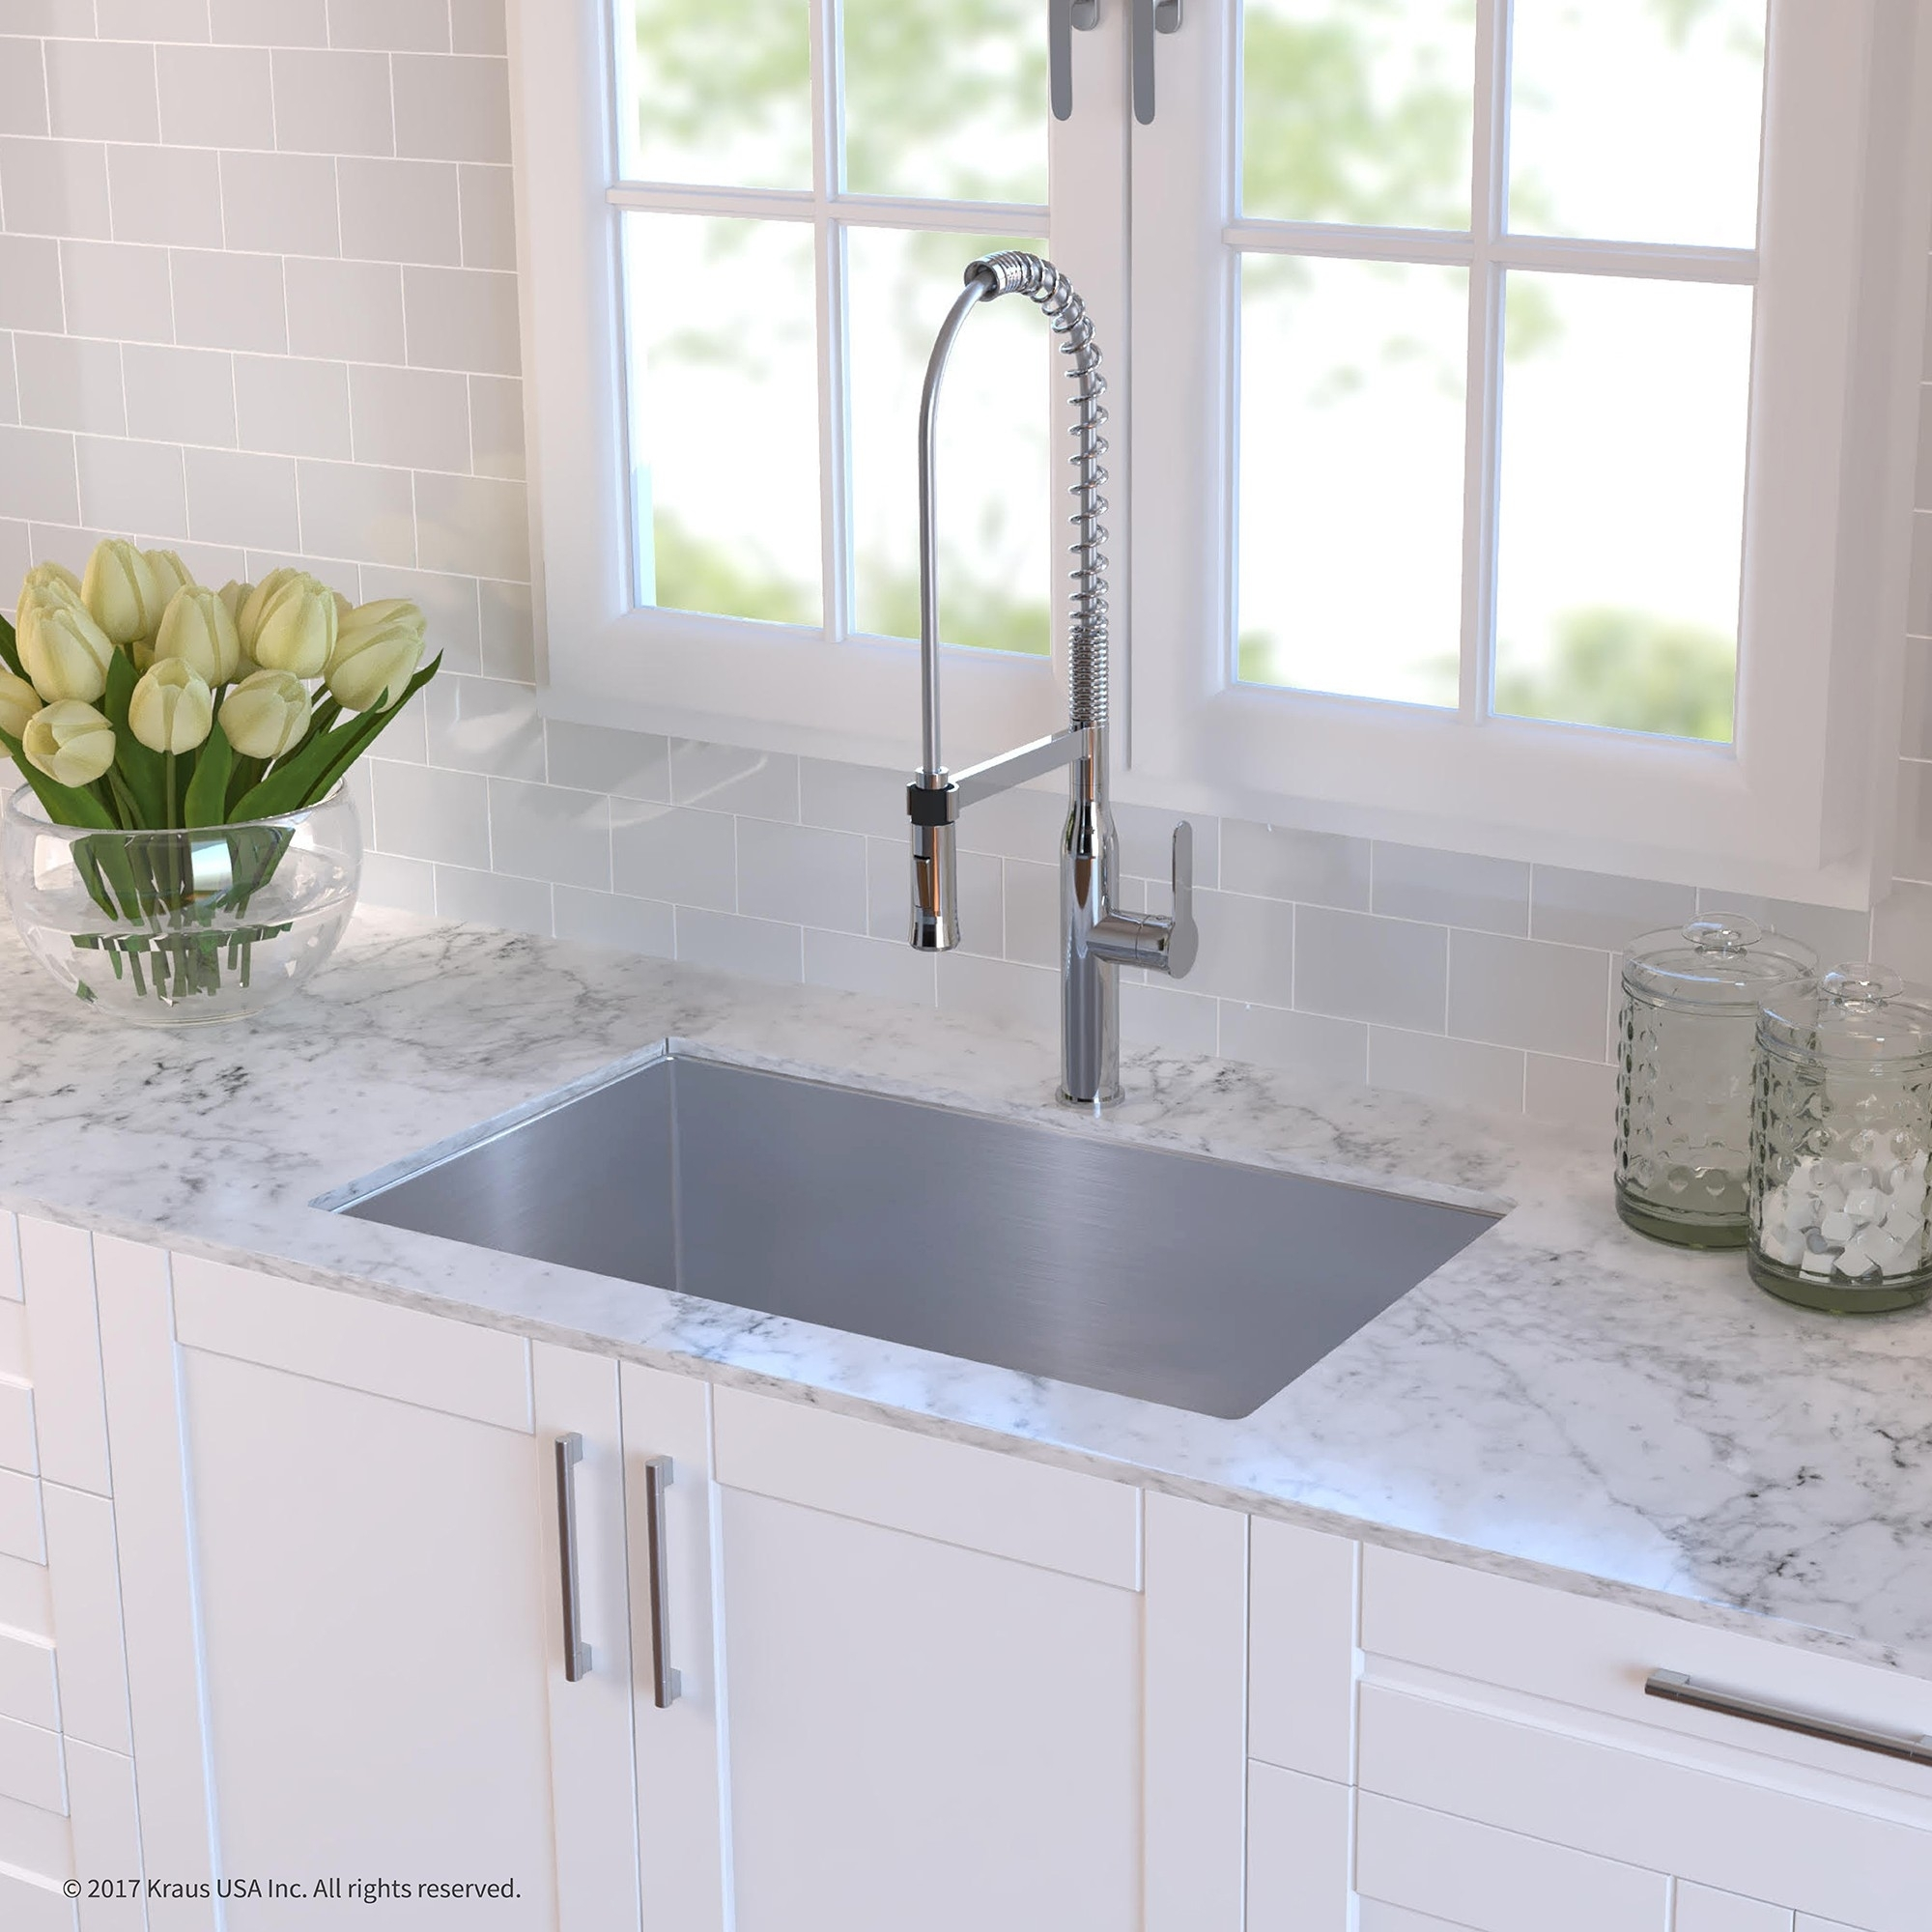 Madison Art Center Design: Commercial Kitchen Sink Faucet